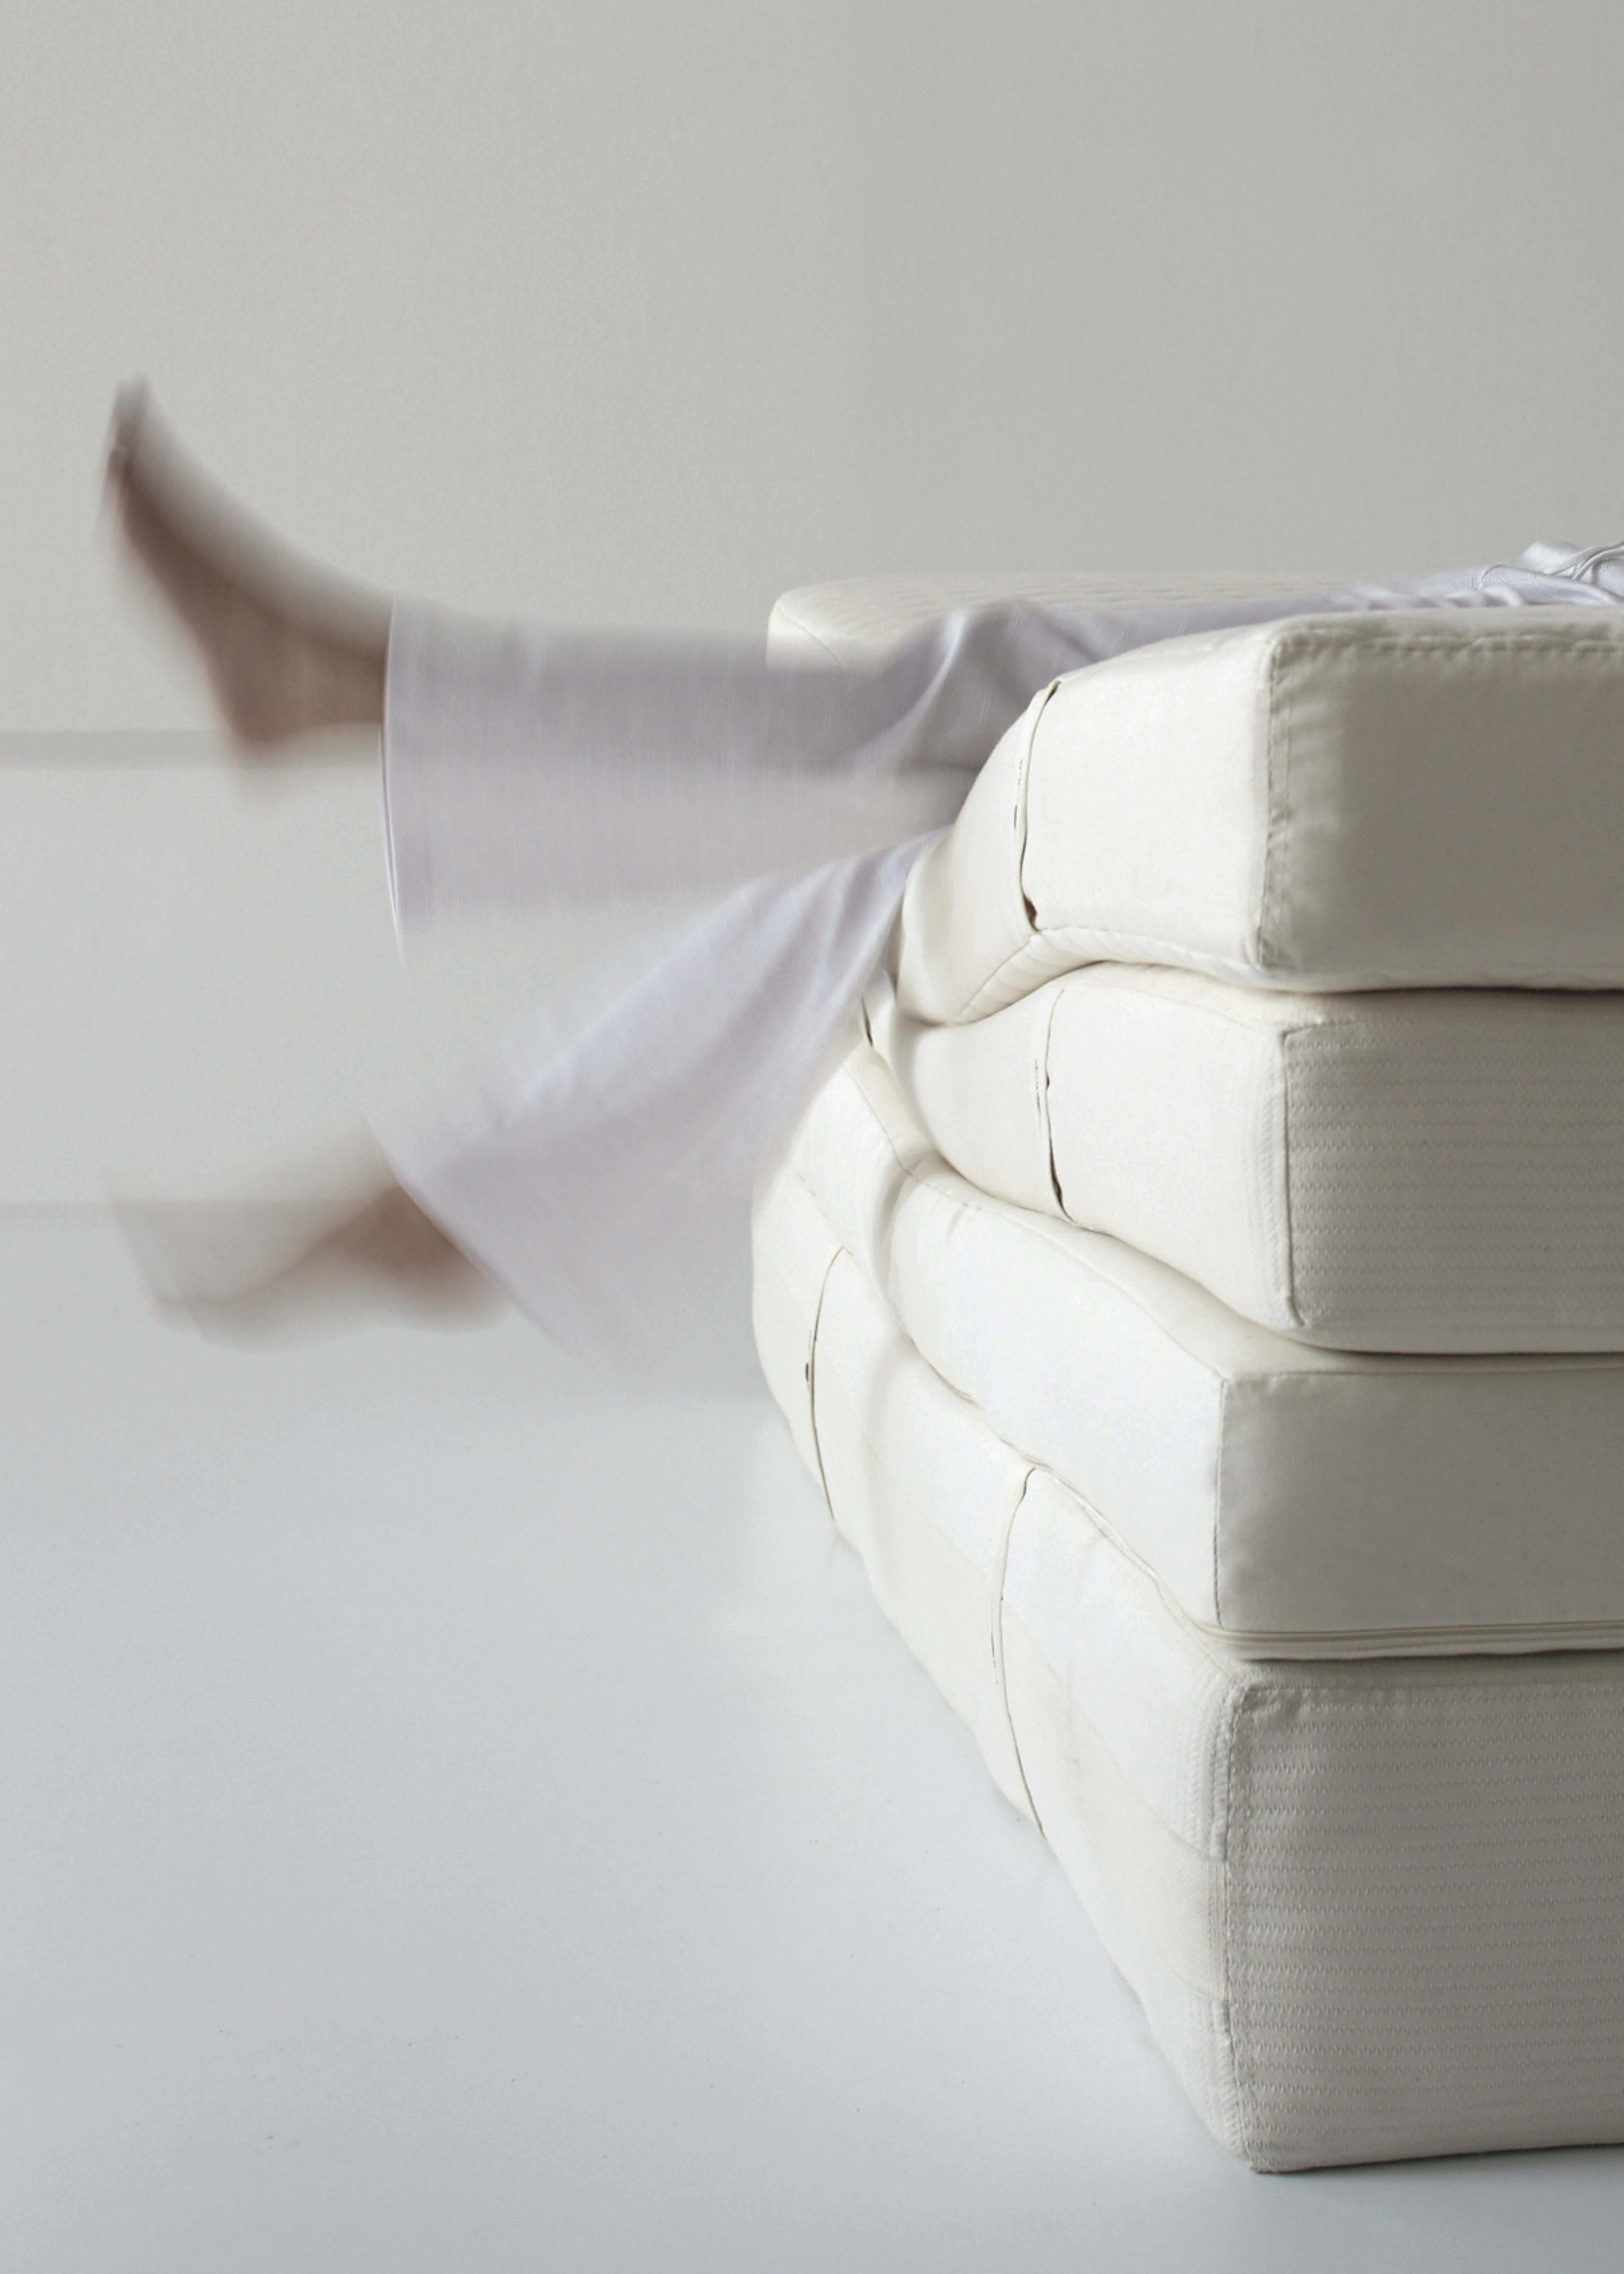 gr ne erde neuestes mitglied im vorstand des qul gr ne. Black Bedroom Furniture Sets. Home Design Ideas